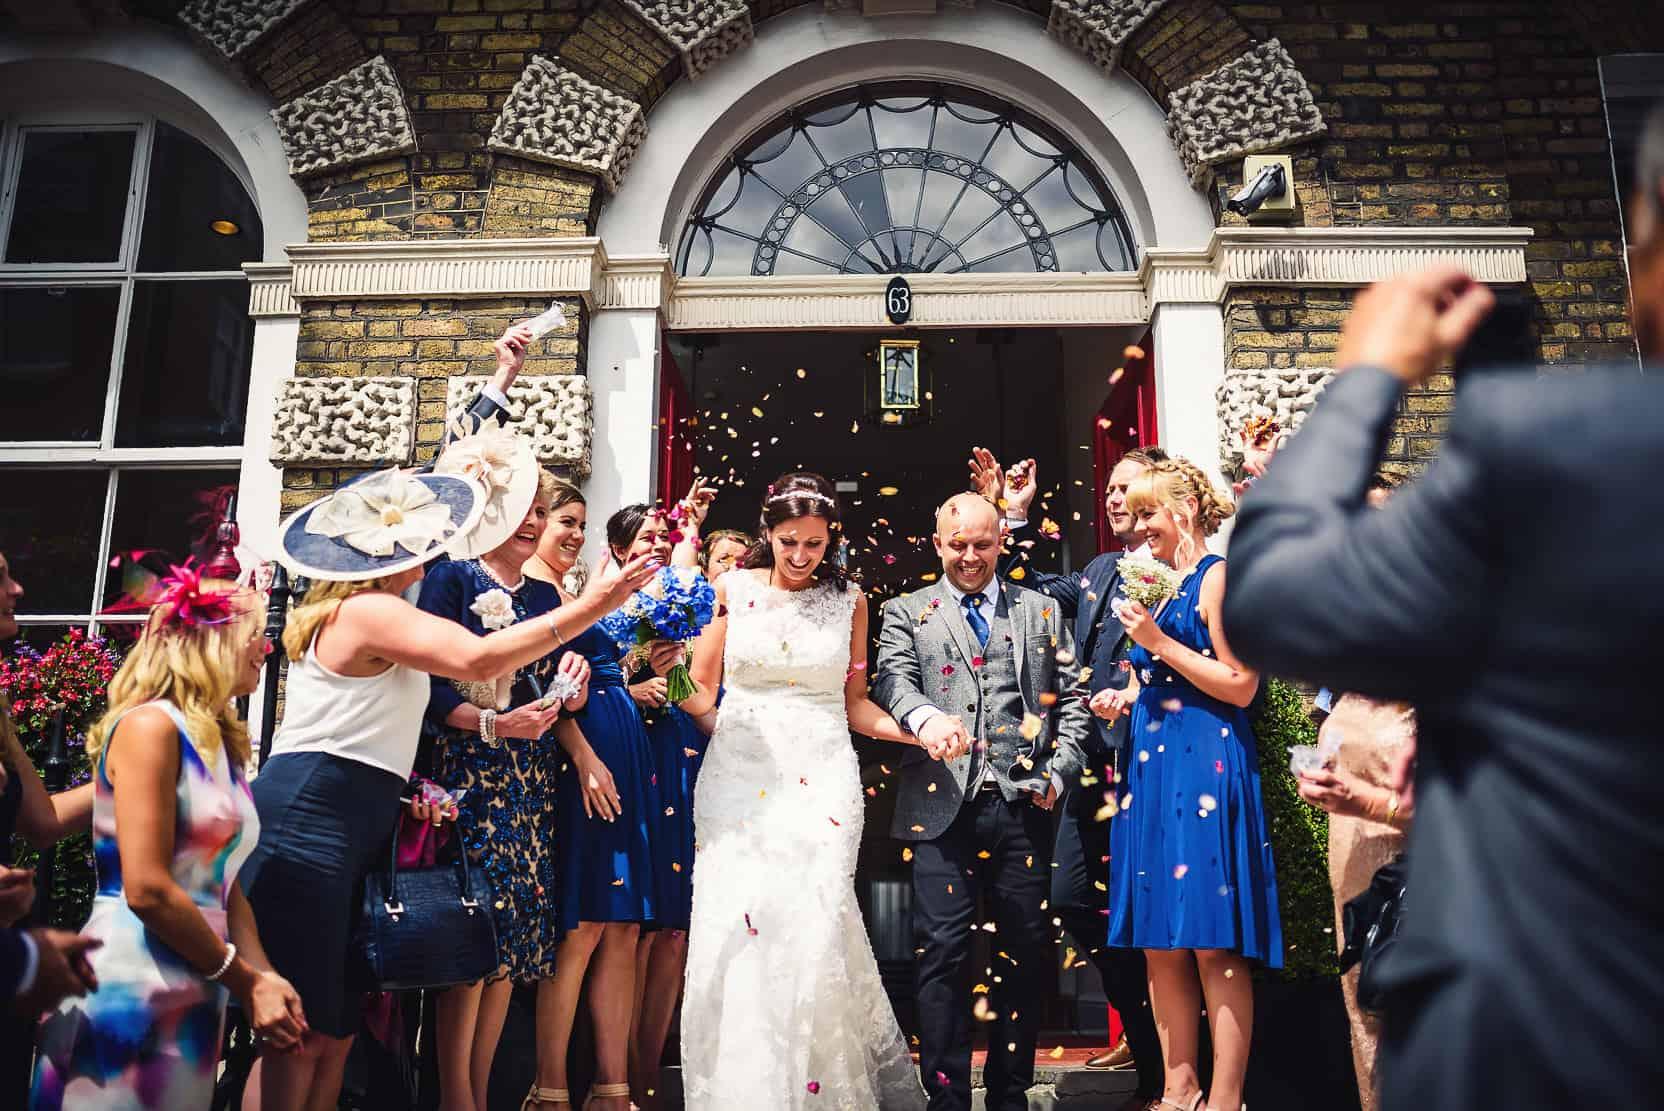 wedding_photography_asia_house_london_ld_justin_bailey_photography_007